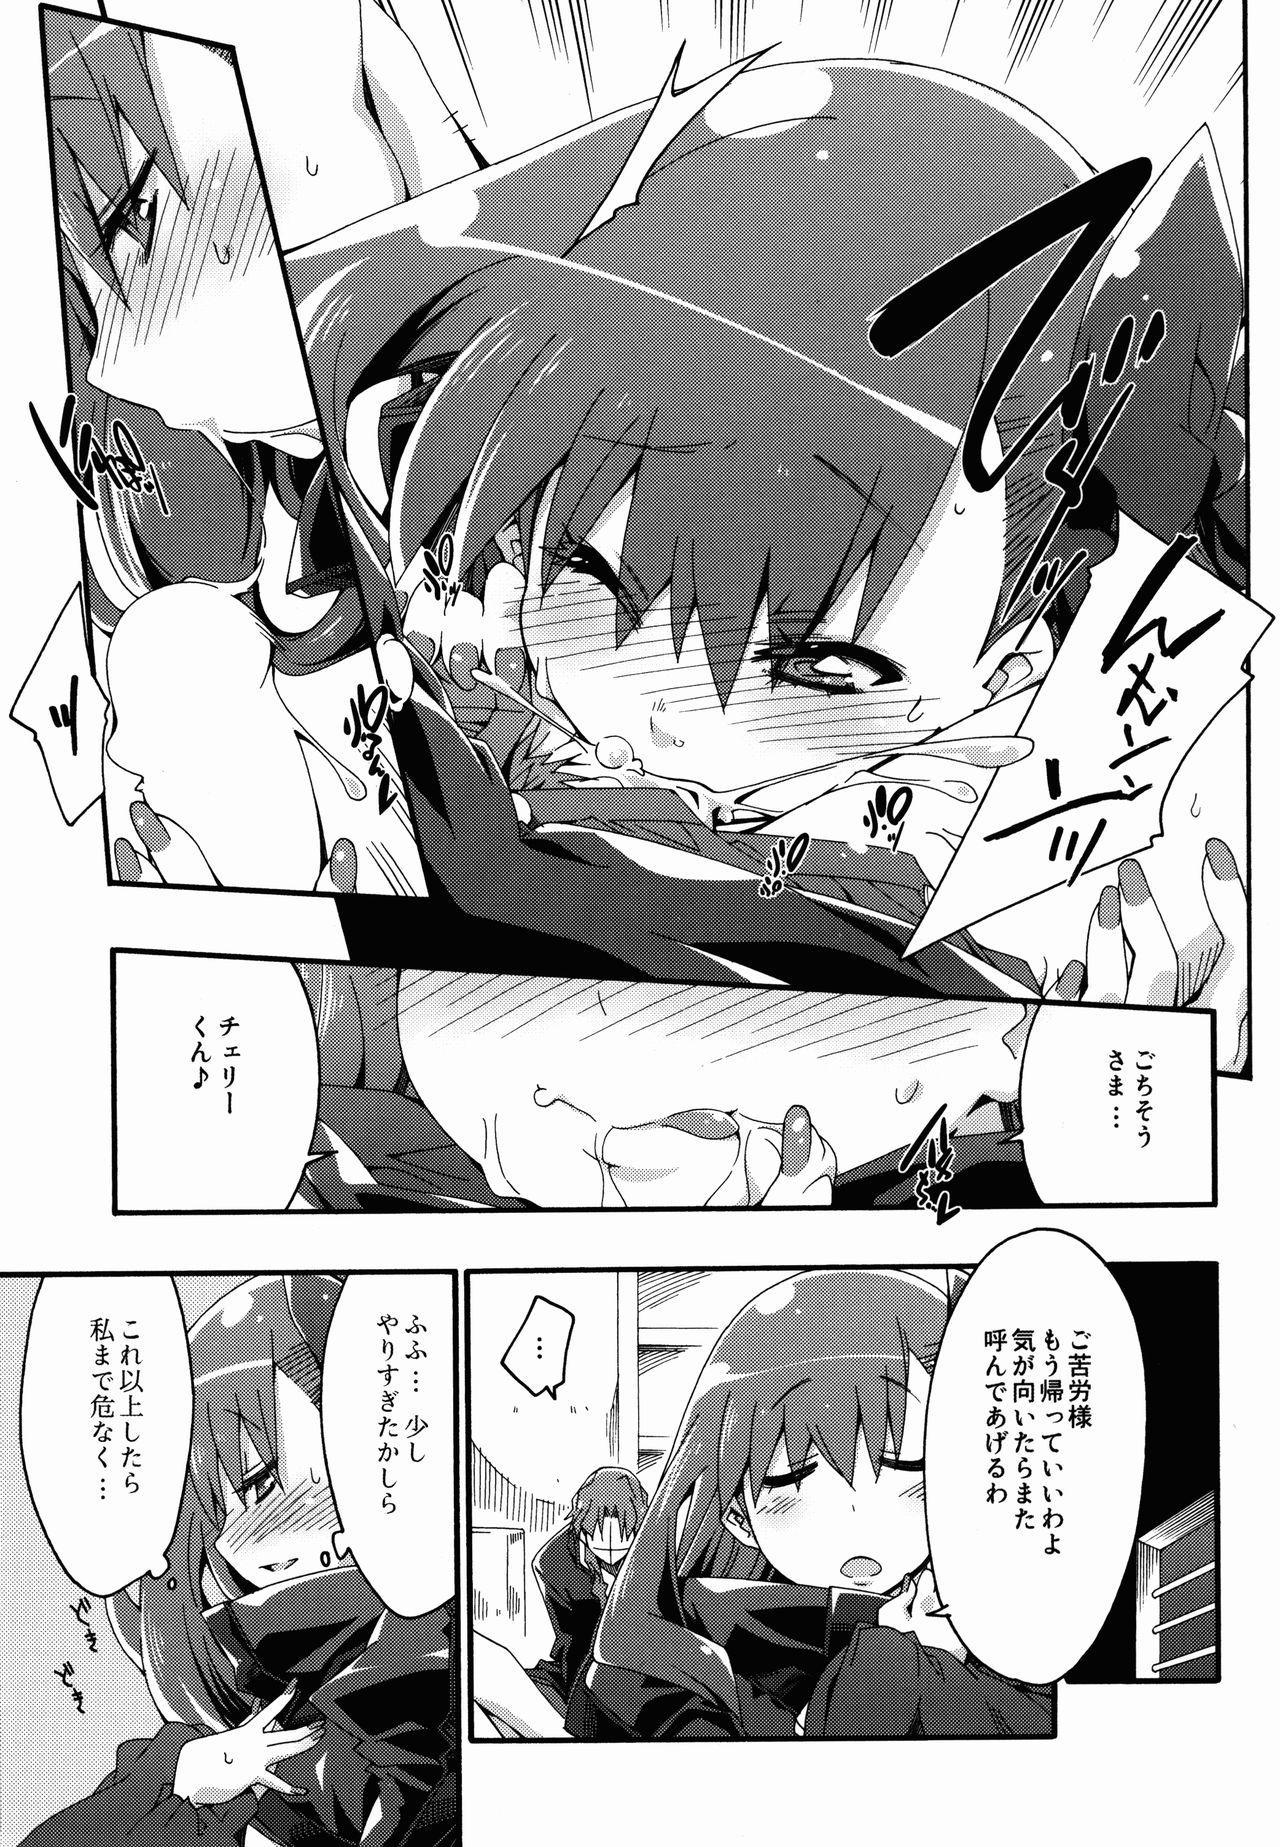 Melty/kiss 14